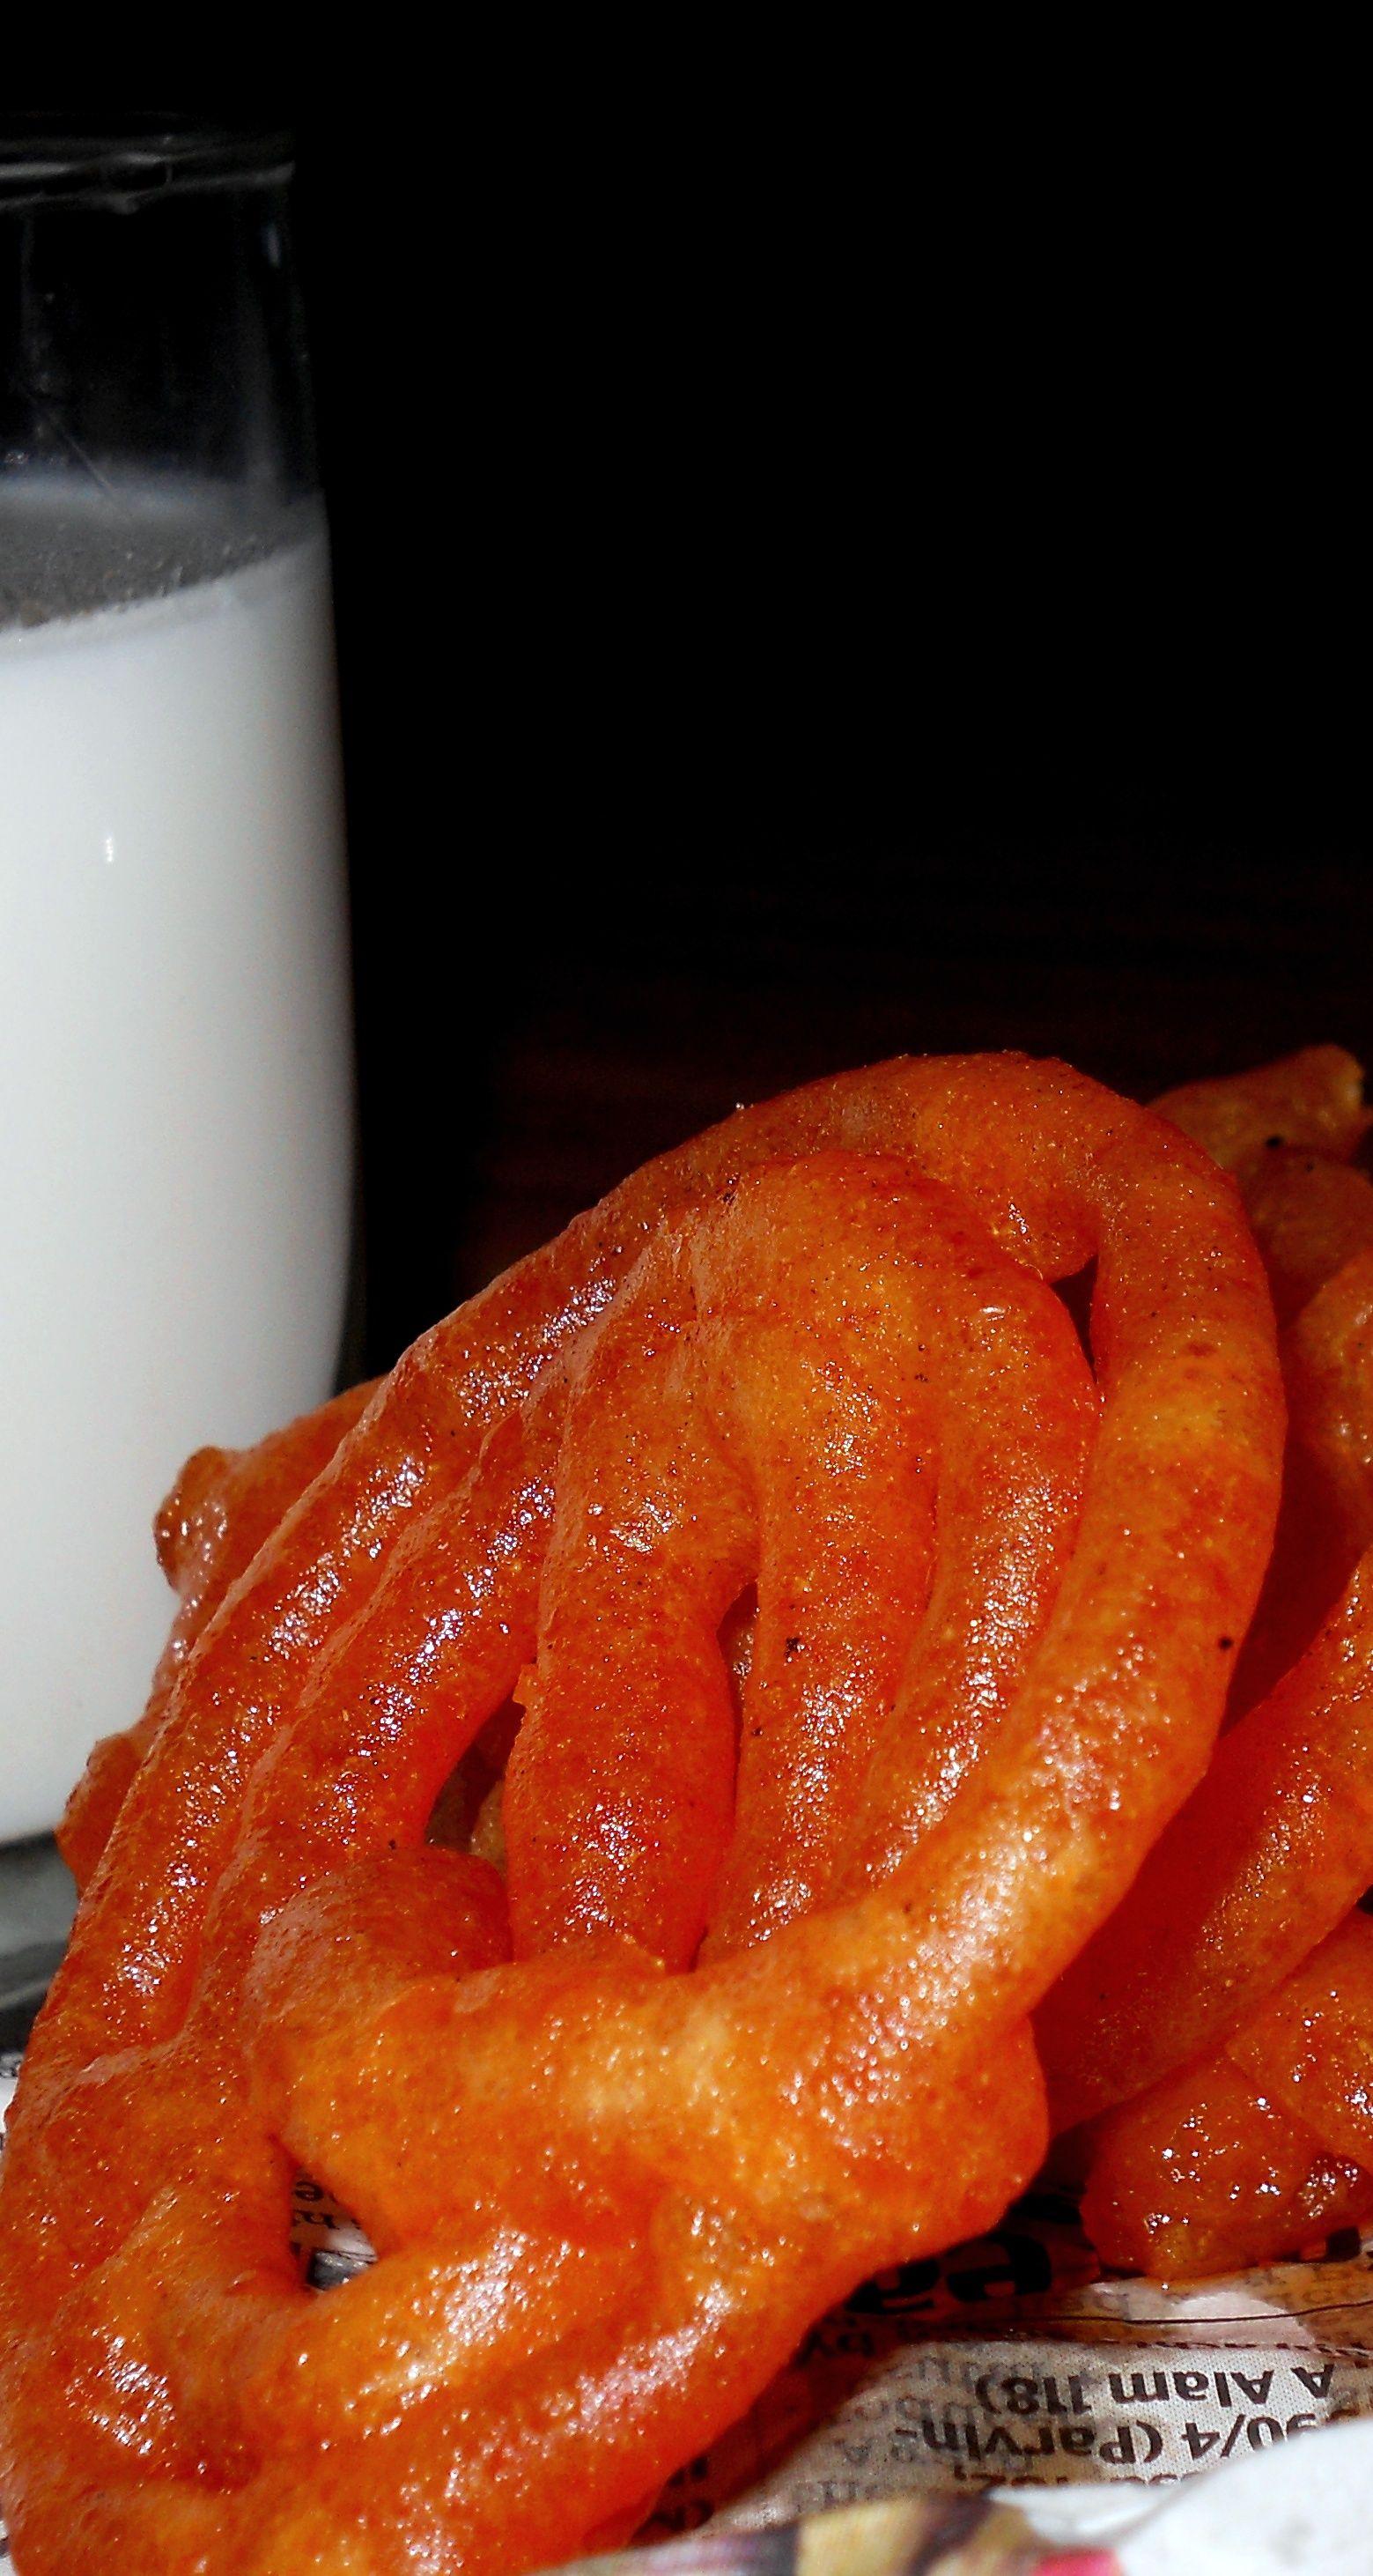 Jalebi with milk classic north indian breakfast desserts jalebi with milk classic north indian breakfast indian street foodindian kitchenindian breakfastindian dishesdesert recipessanjeev kapoorindian forumfinder Gallery